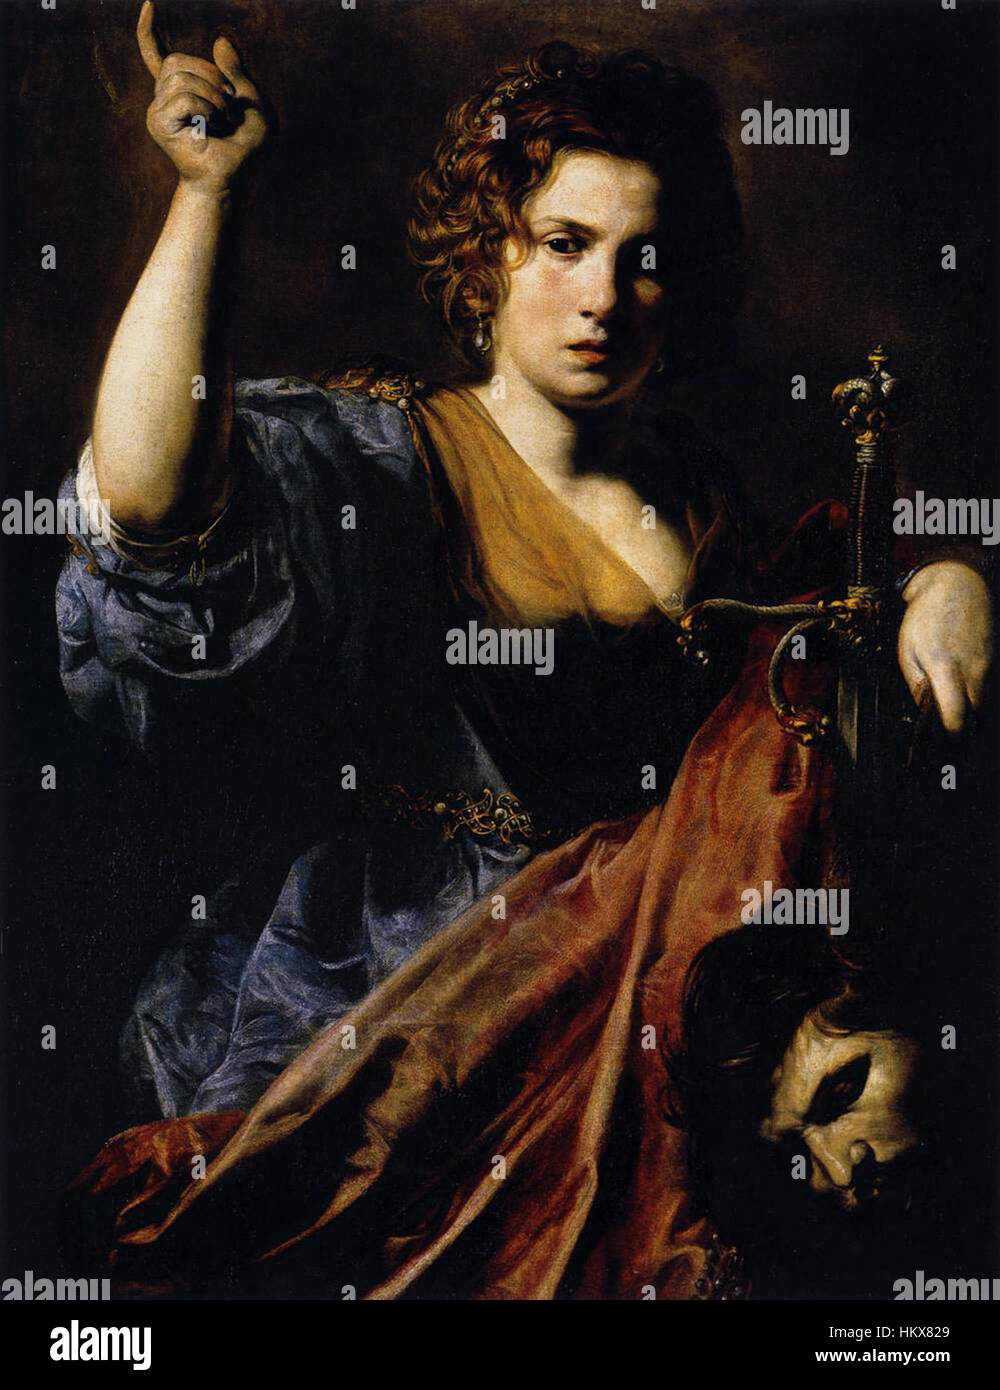 Valentin de Boulogne, Judith - Stock Image